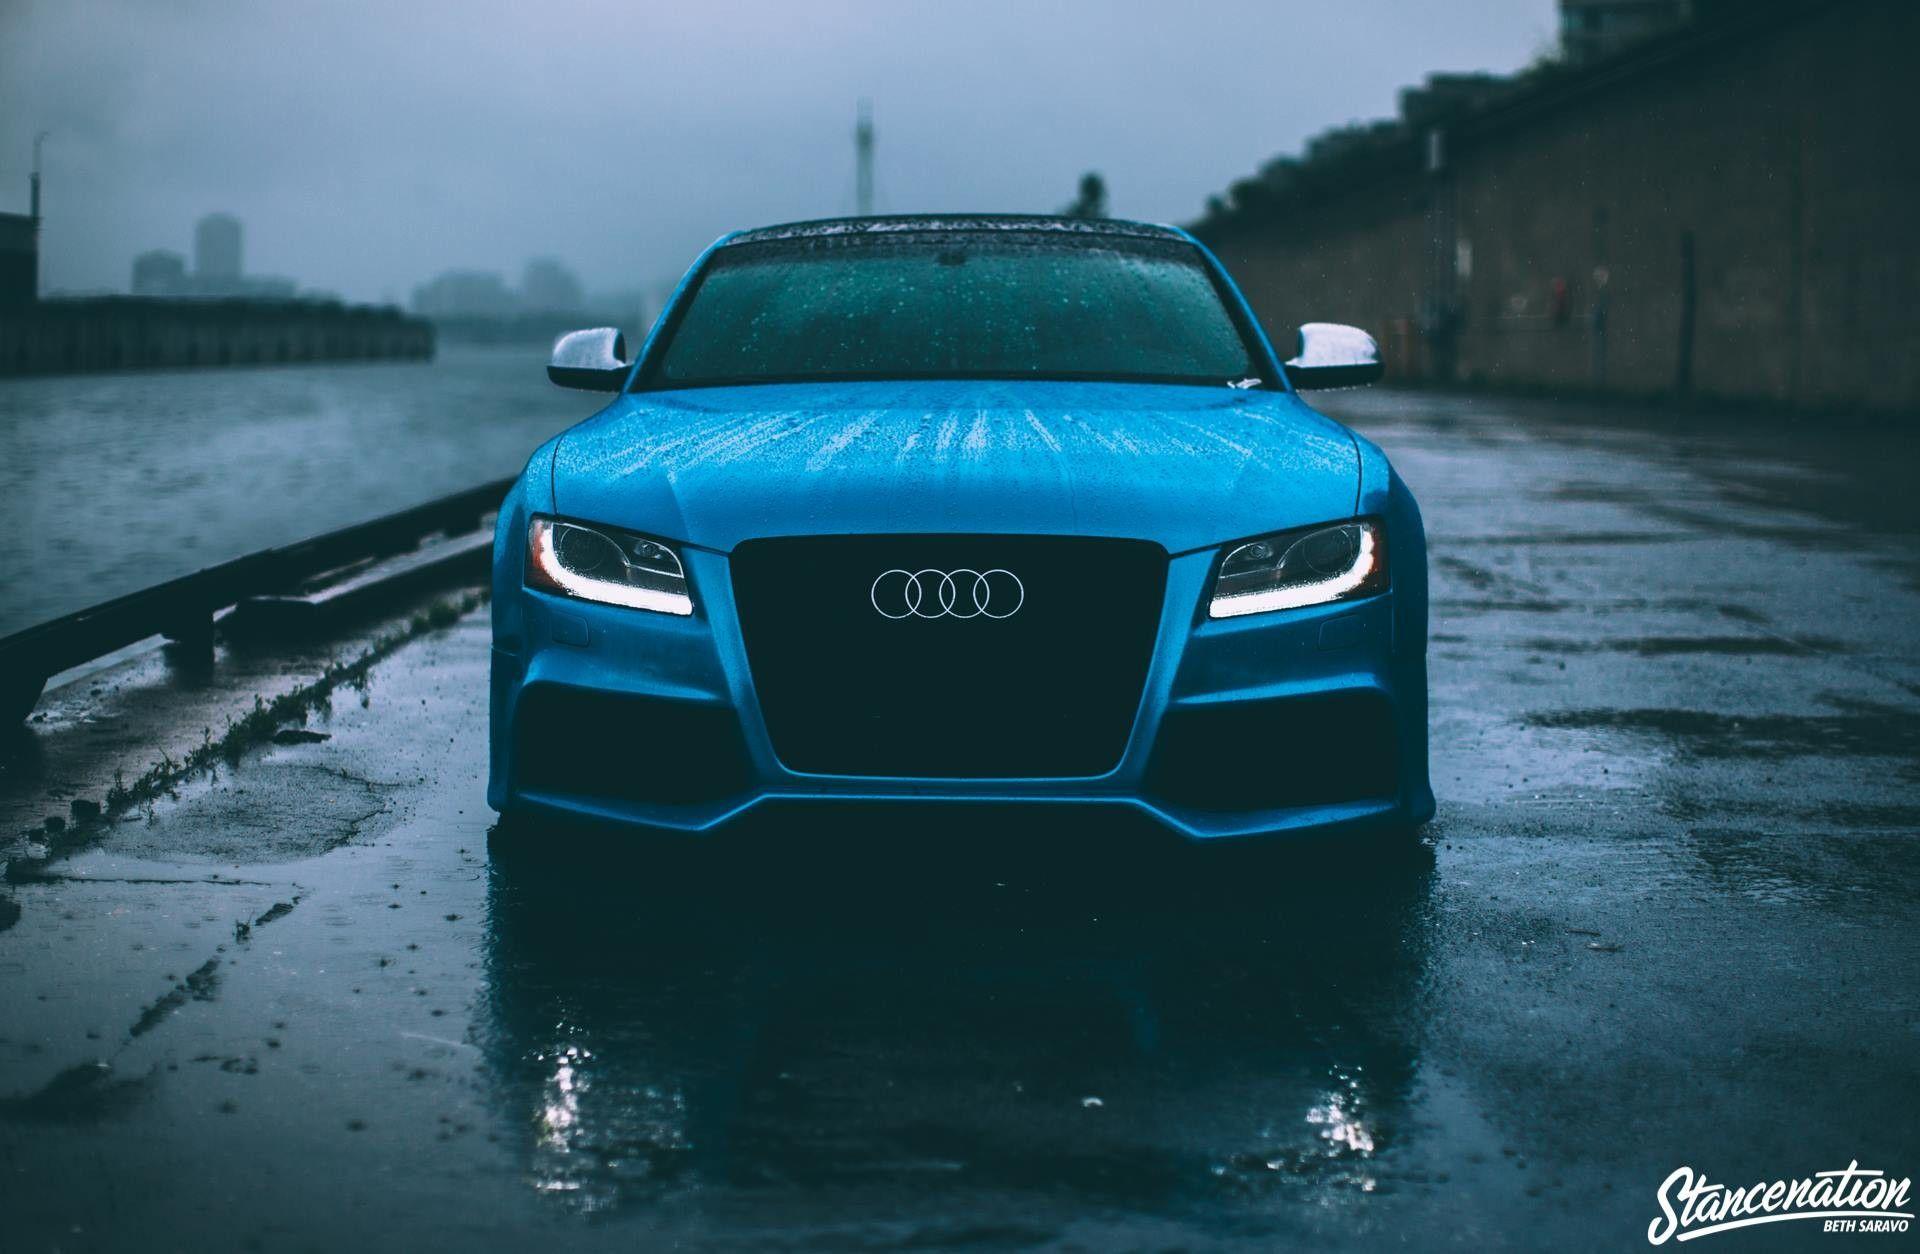 General 1920x1254 Audi S5 Audi Car Blue Cars Vehicle Rain Vehiculo De Lujo Autos Exoticos Autos